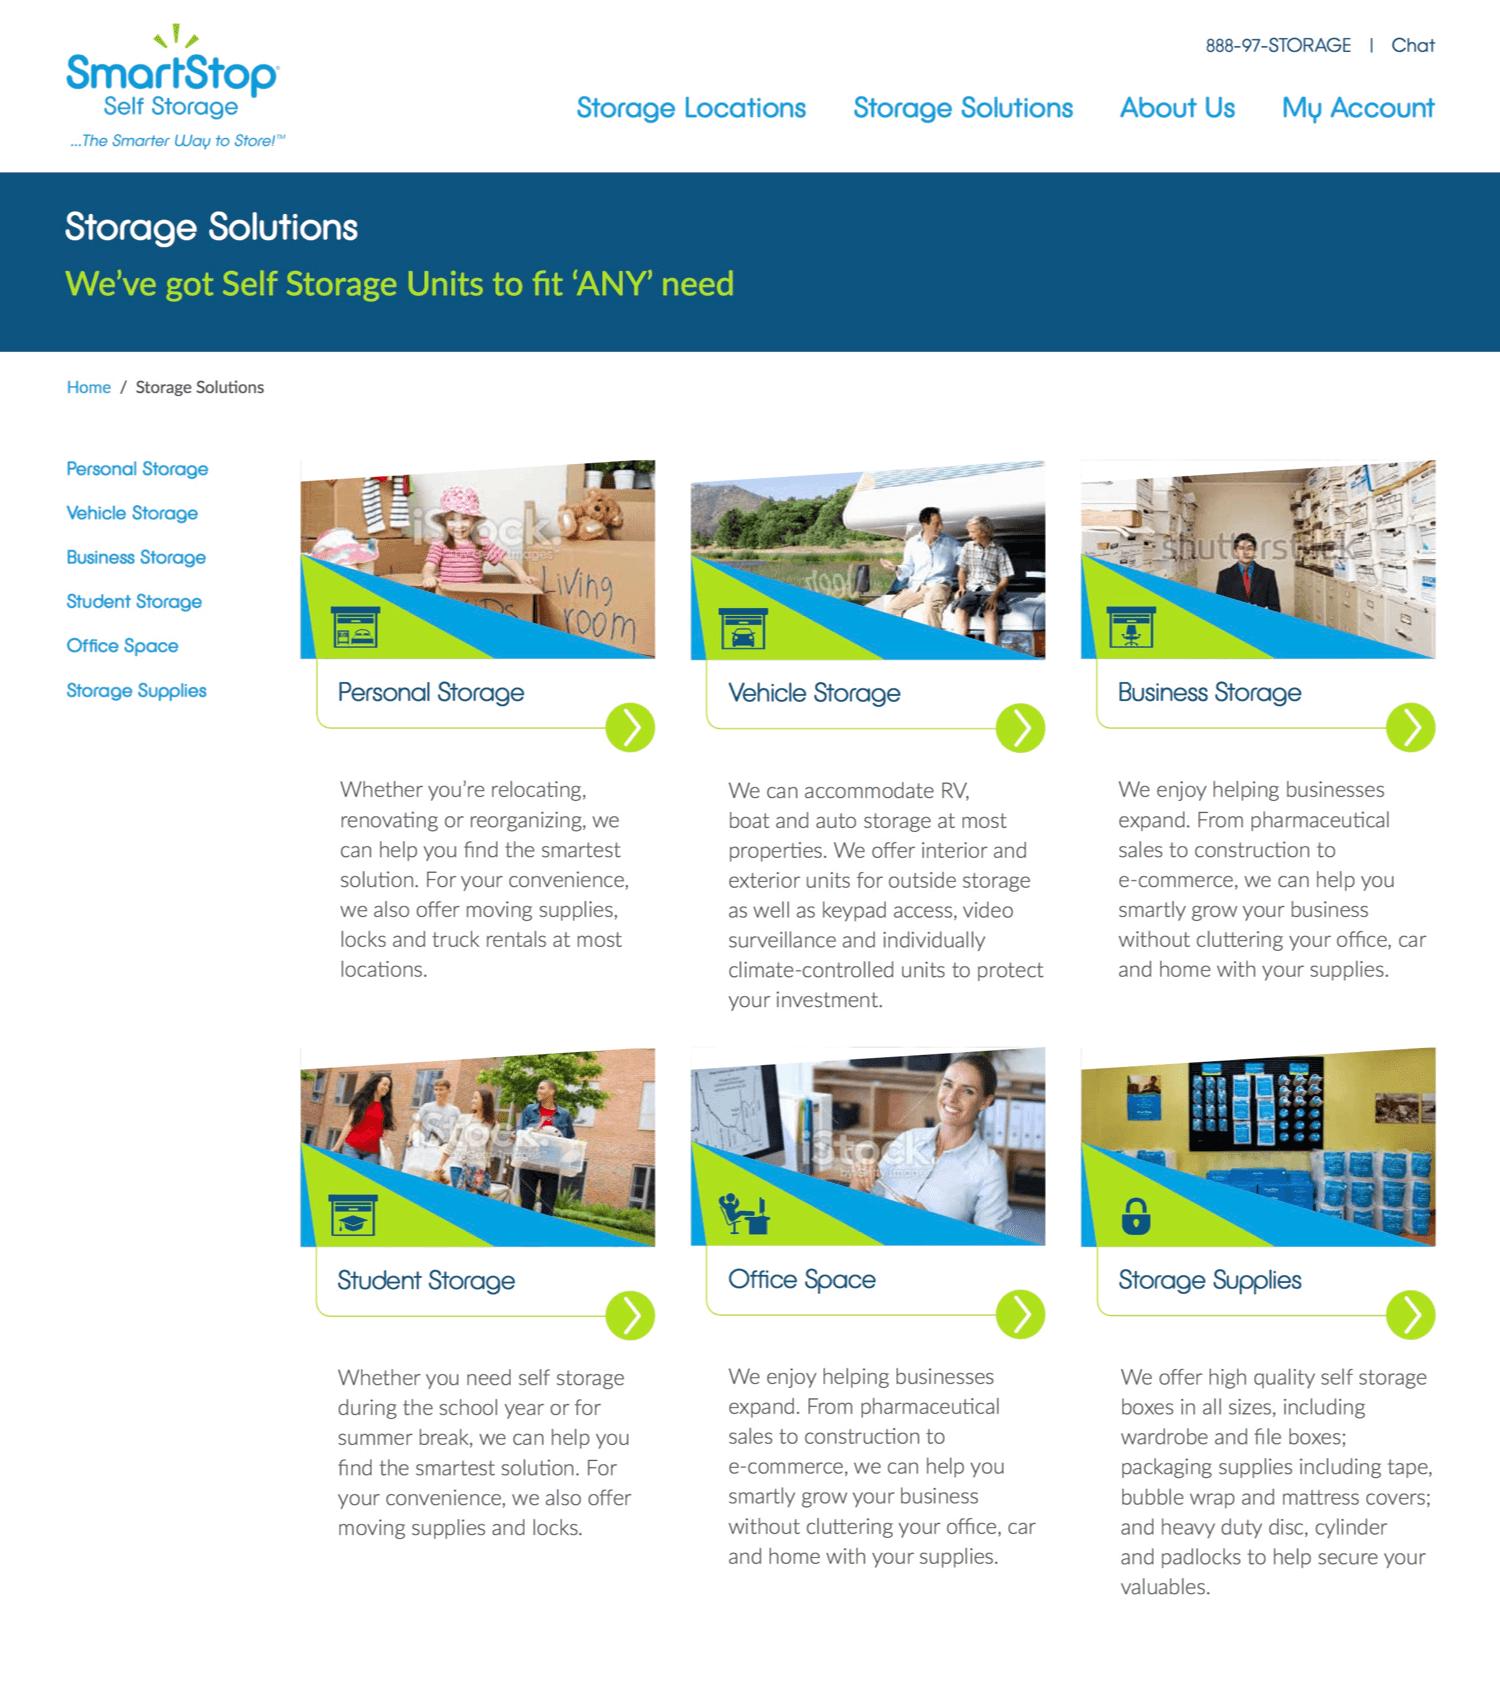 SmartStop-Self-Storage-Units-Website-Design-Storage-Solutions-Page